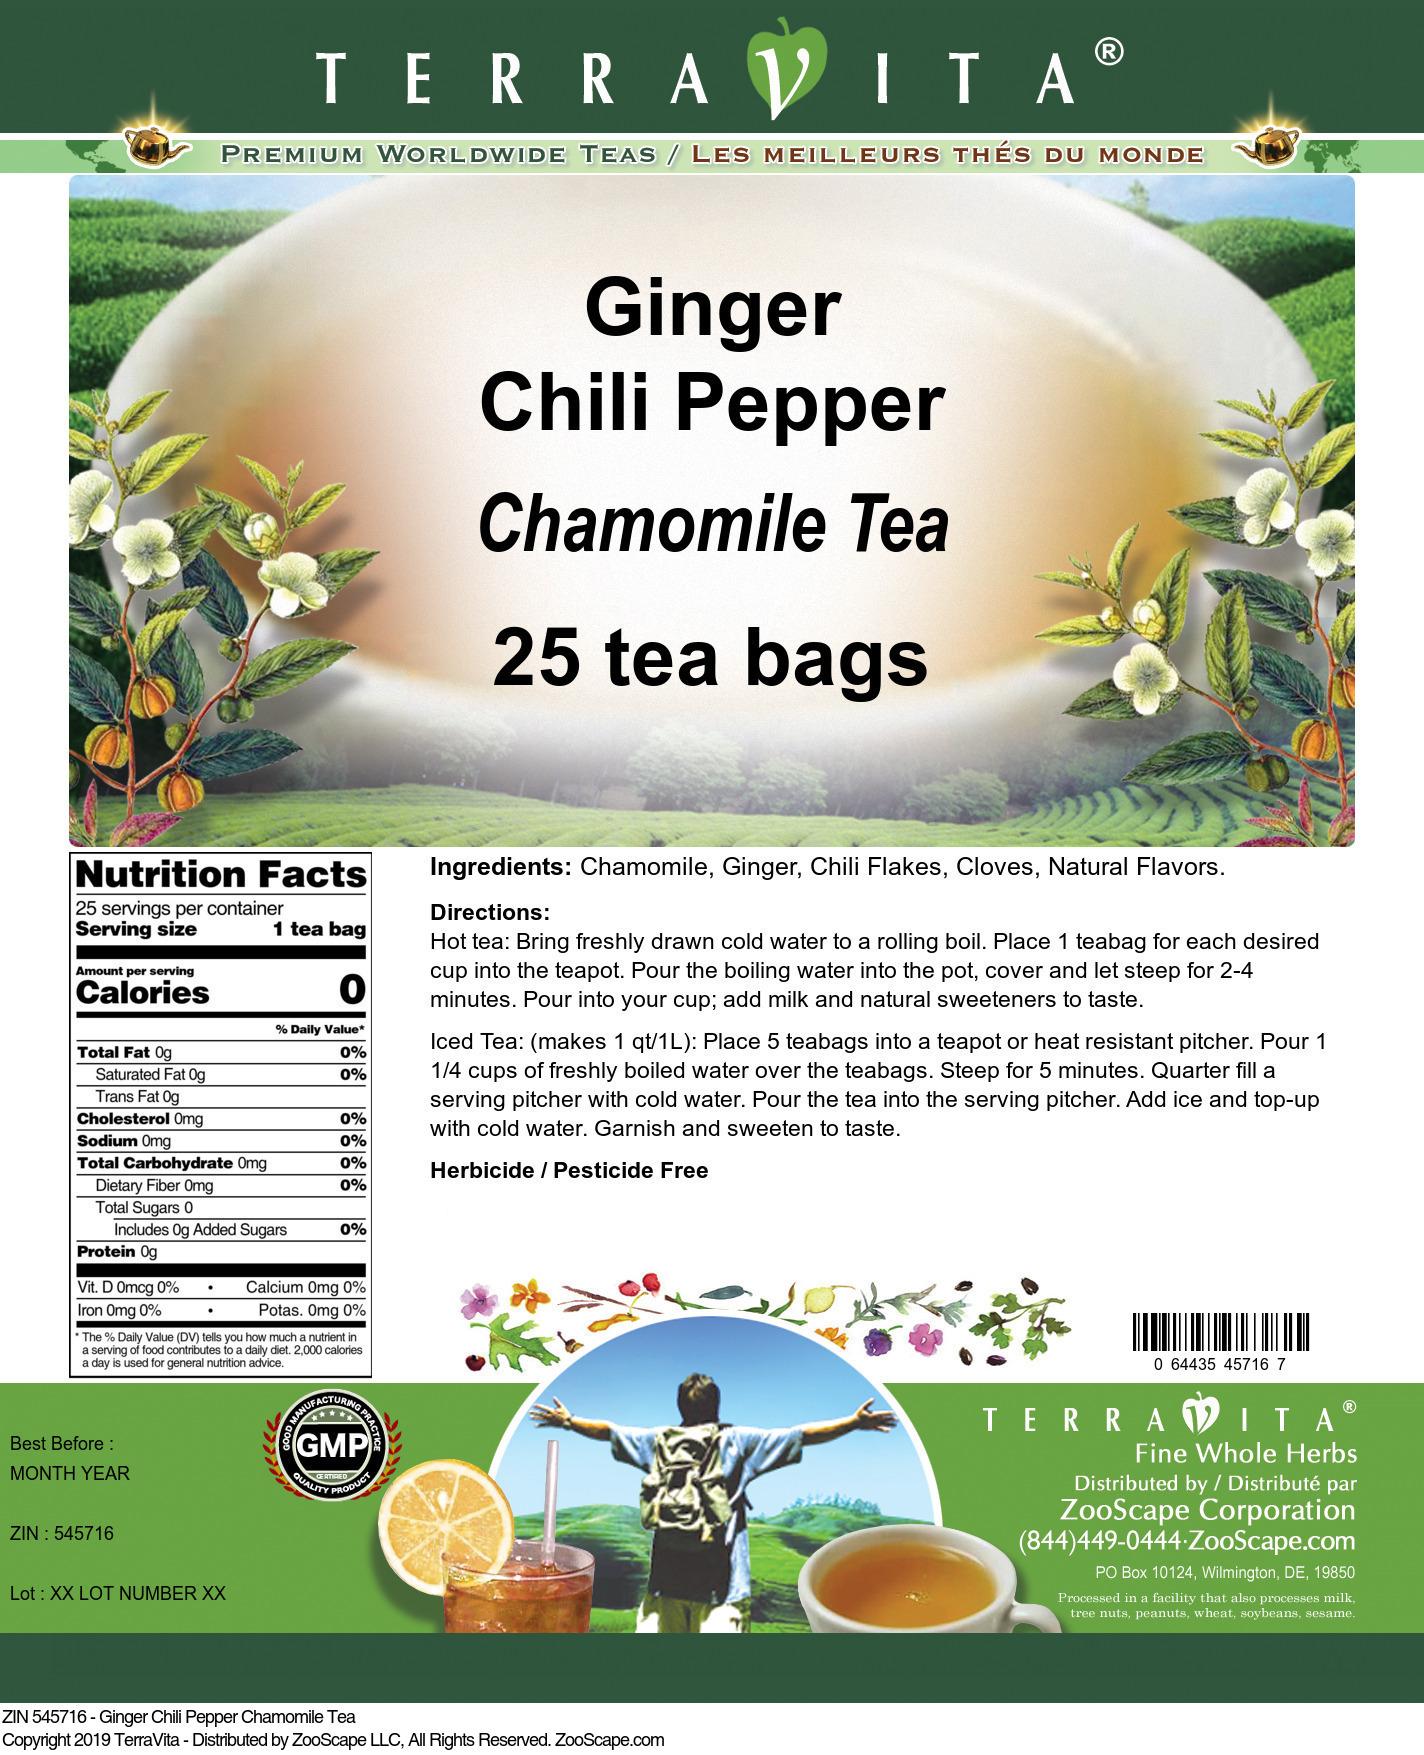 Ginger Chili Pepper Chamomile Tea